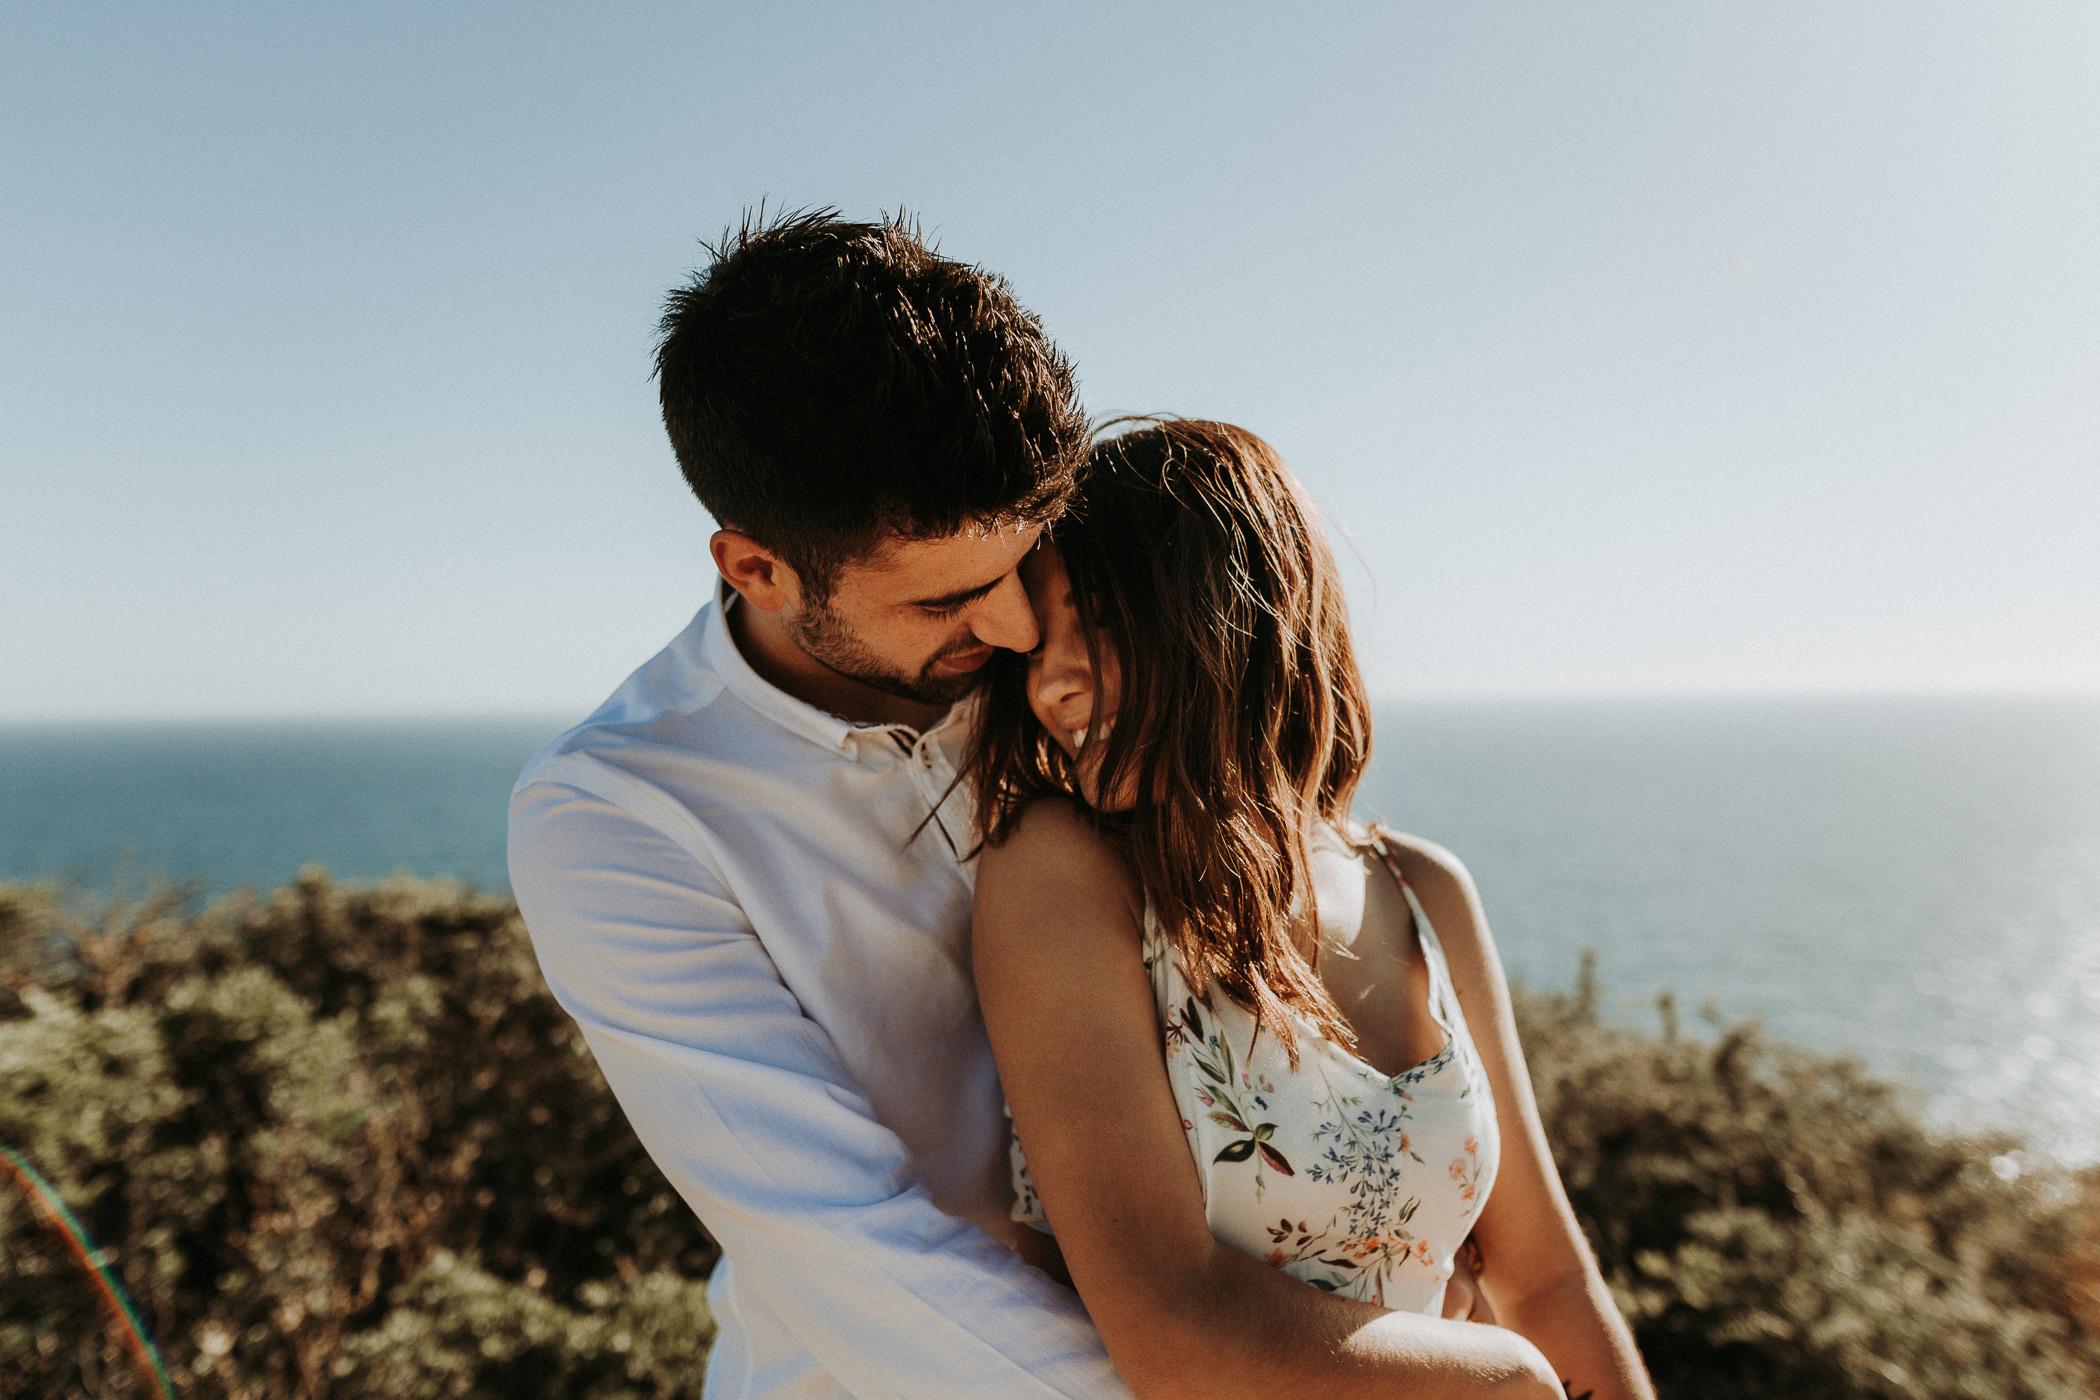 DanielaMarquardtPhotography_wedding_elopement_mallorca_spain_calapi_palma_lauraandtoni_127